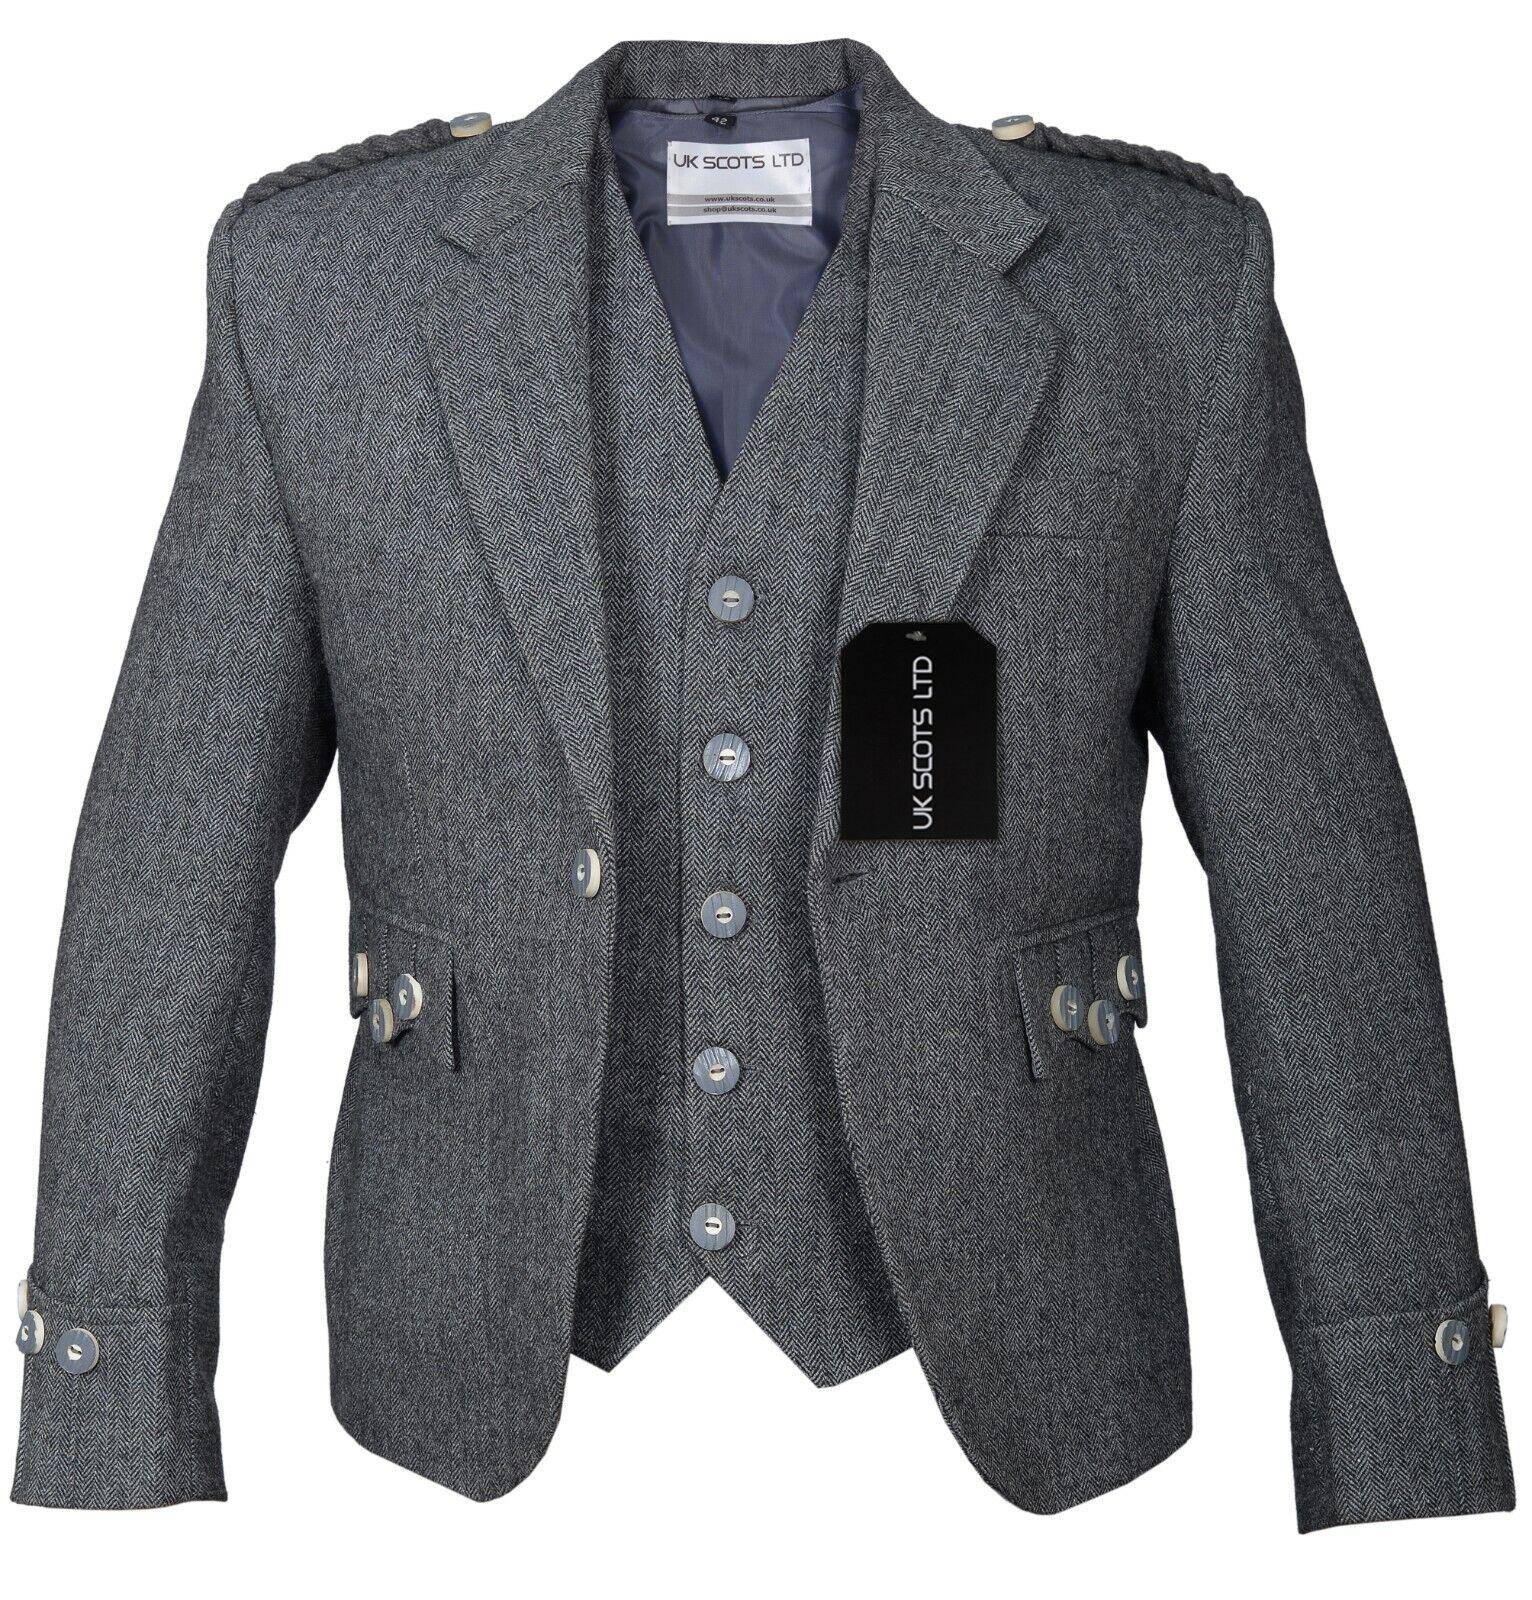 Grey Tweed Argyll Jacket & Vest Pure Wool Matching Bone Buttons